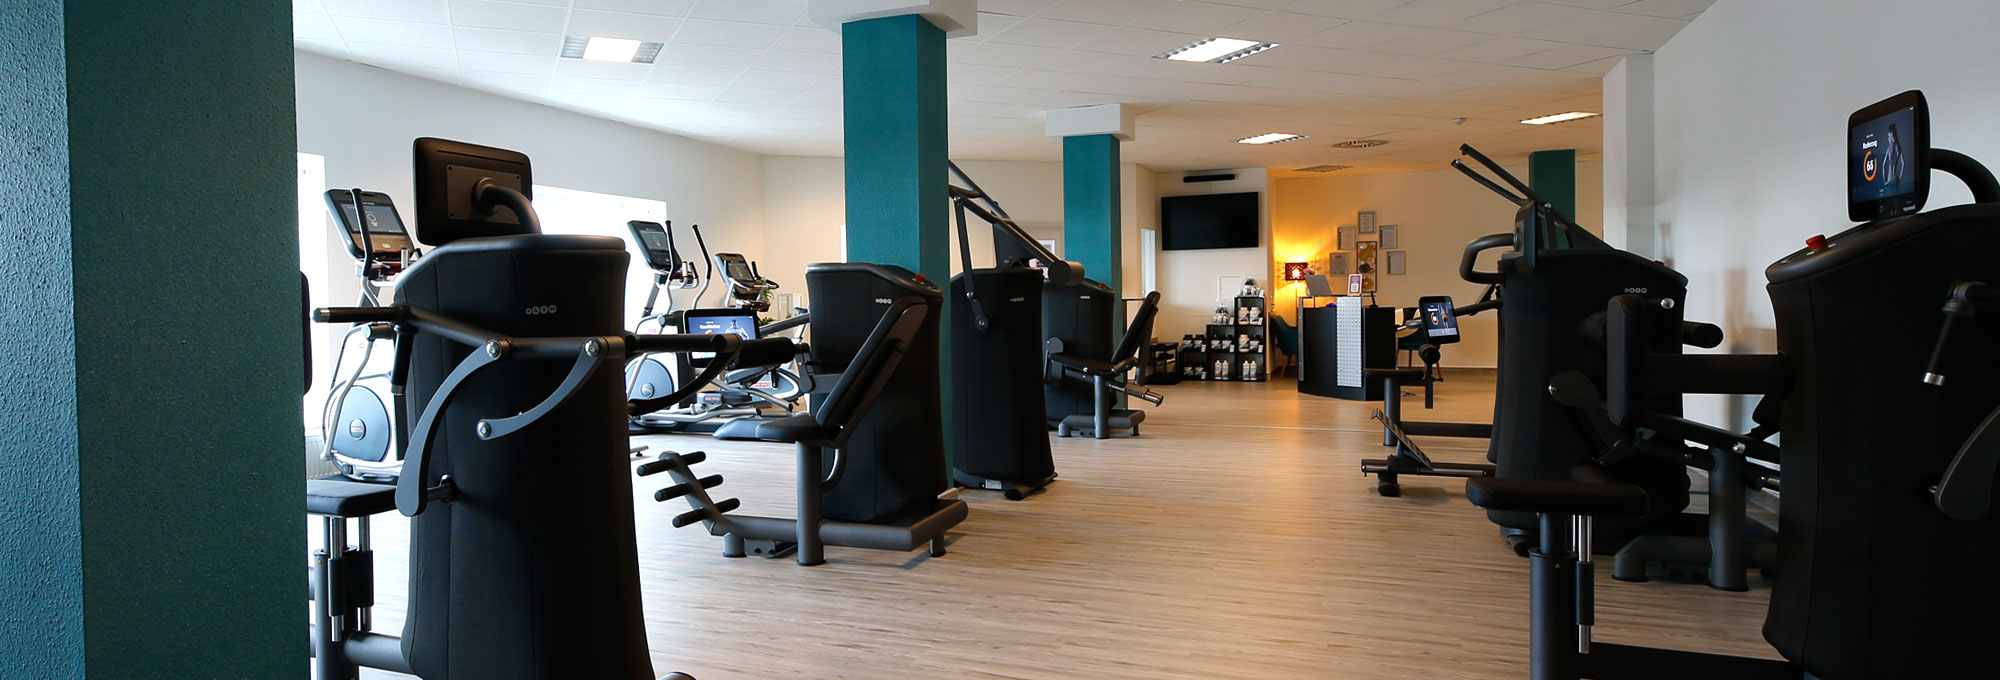 EGYM Zirkel im PASSION Sport's - deinem Fitnessstudio in Nossen